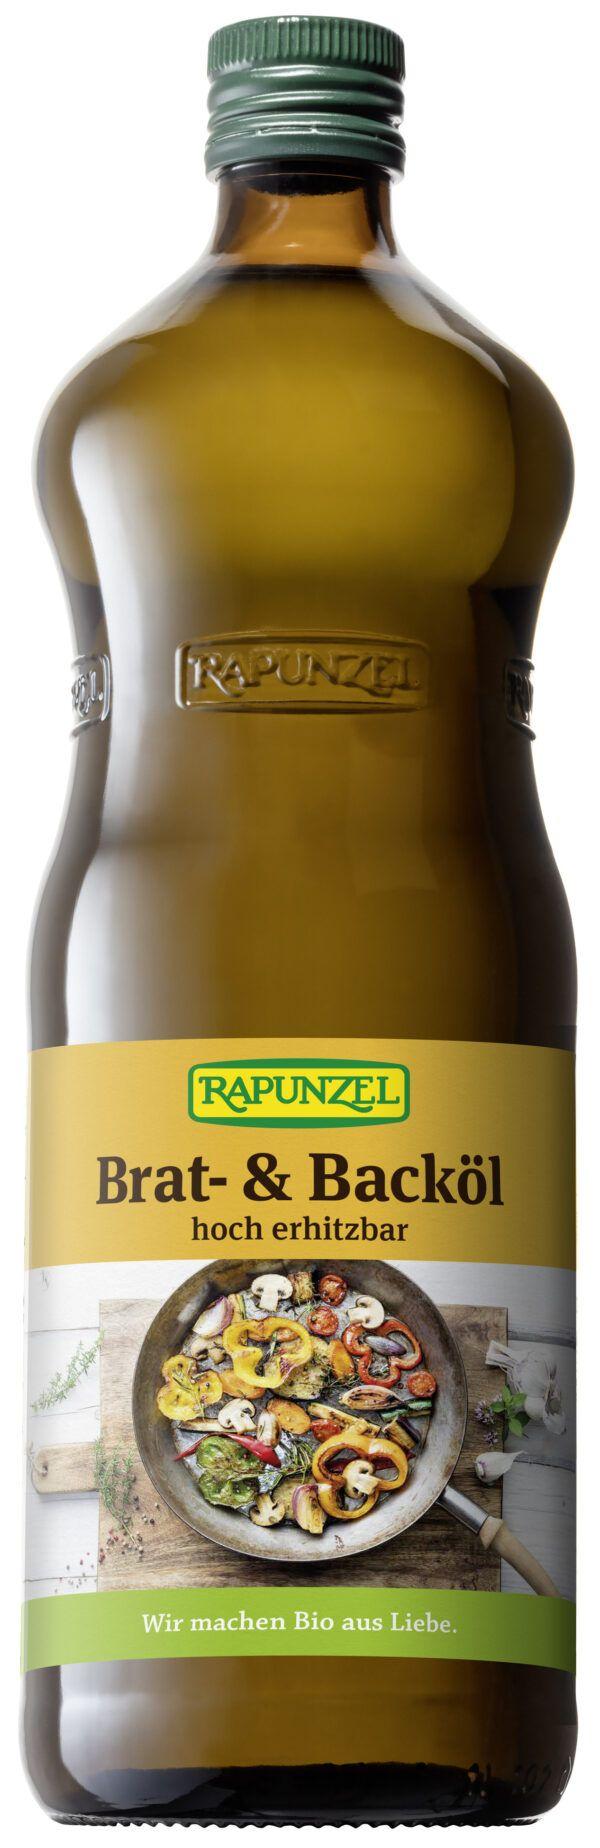 Rapunzel Brat- und Backöl 1l